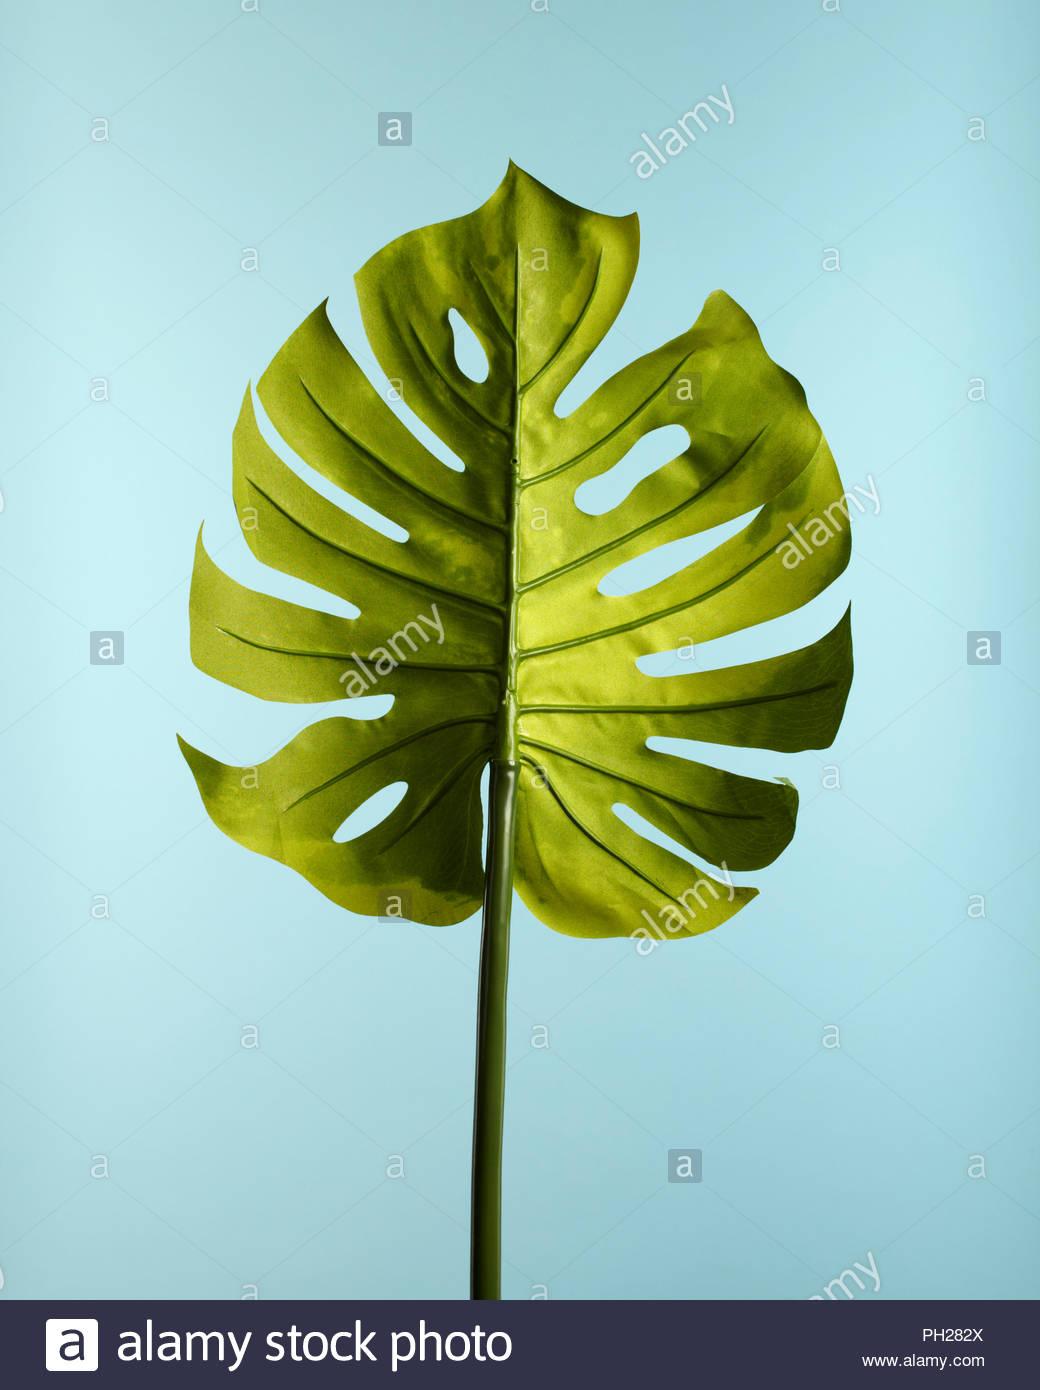 Palm leaf on blue background - Stock Image